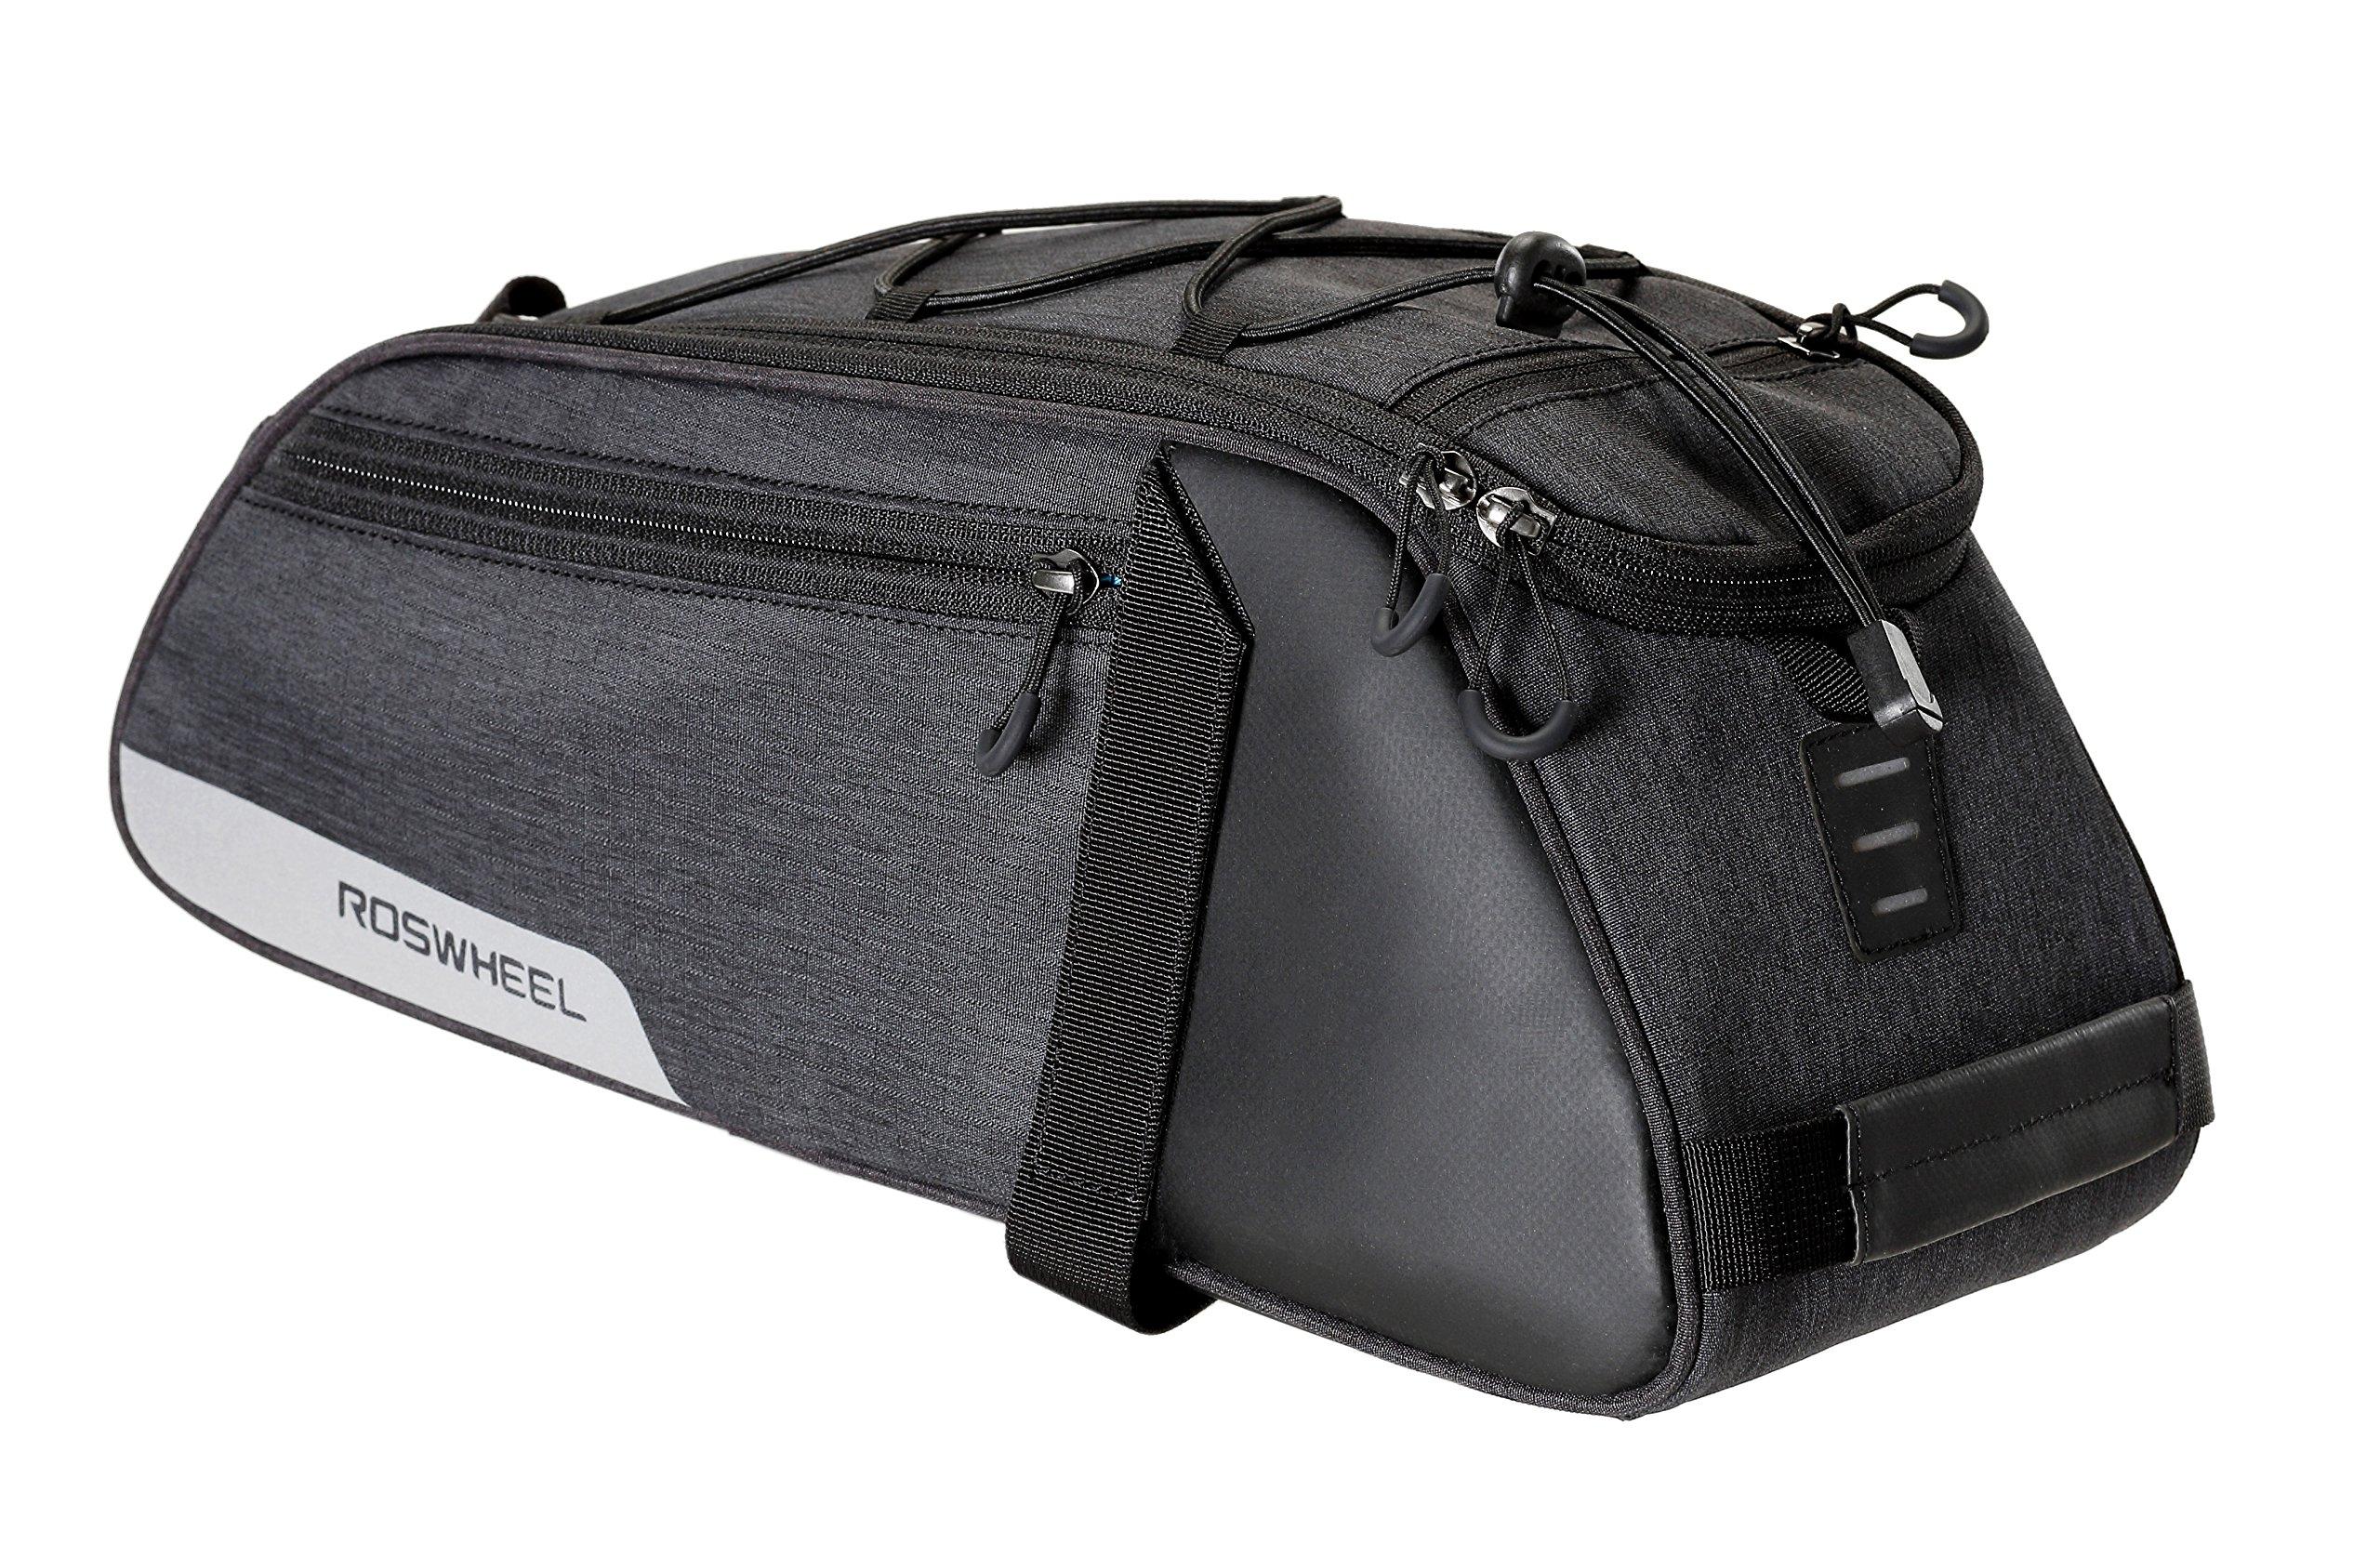 Roswheel Essentials Series 141466 Bike Trunk Bag Bicycle Rear Rack Pack Cycling Accessories Pannier, 8L Capacity by Roswheel (Image #2)